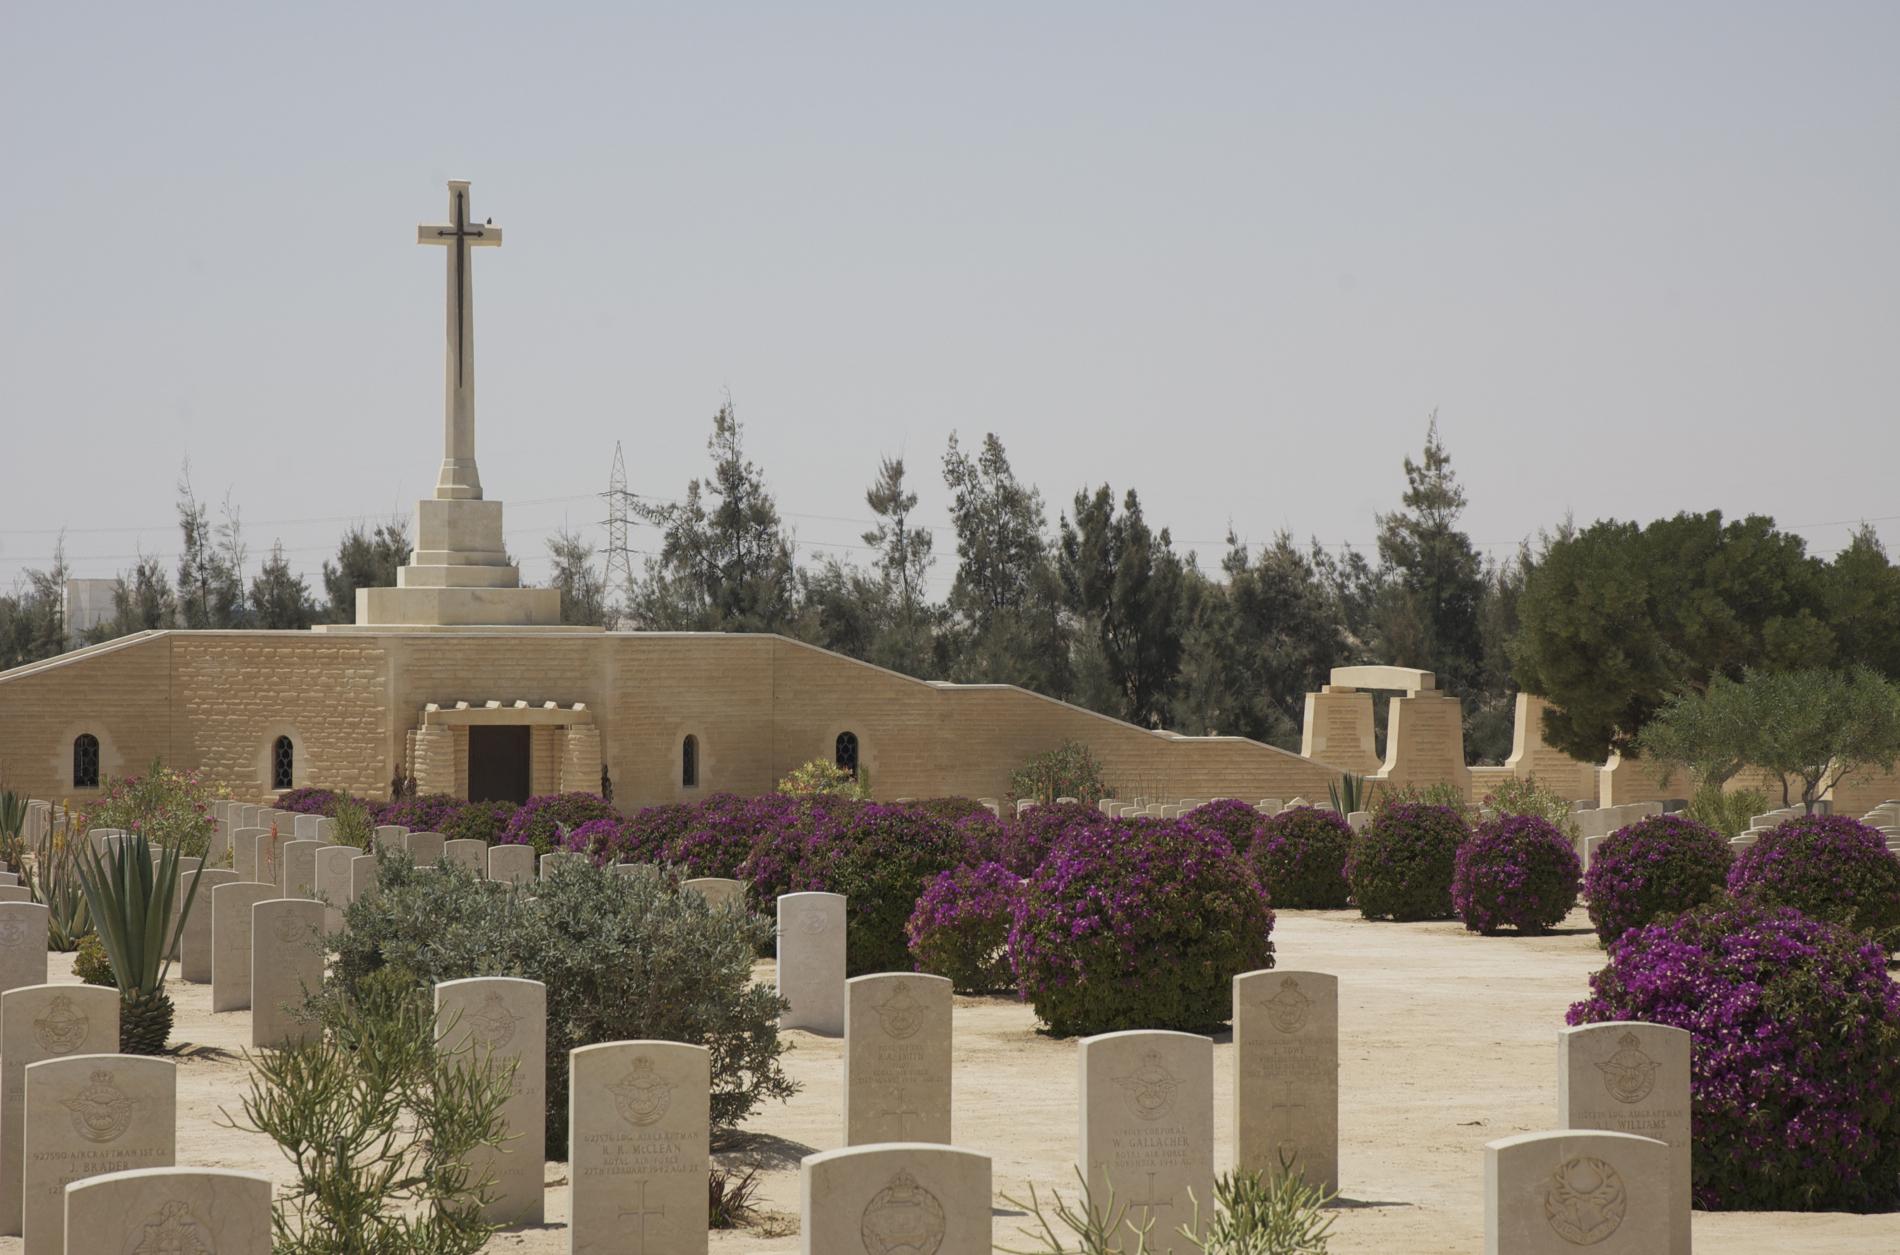 069_el_alamein_british_memorial_1